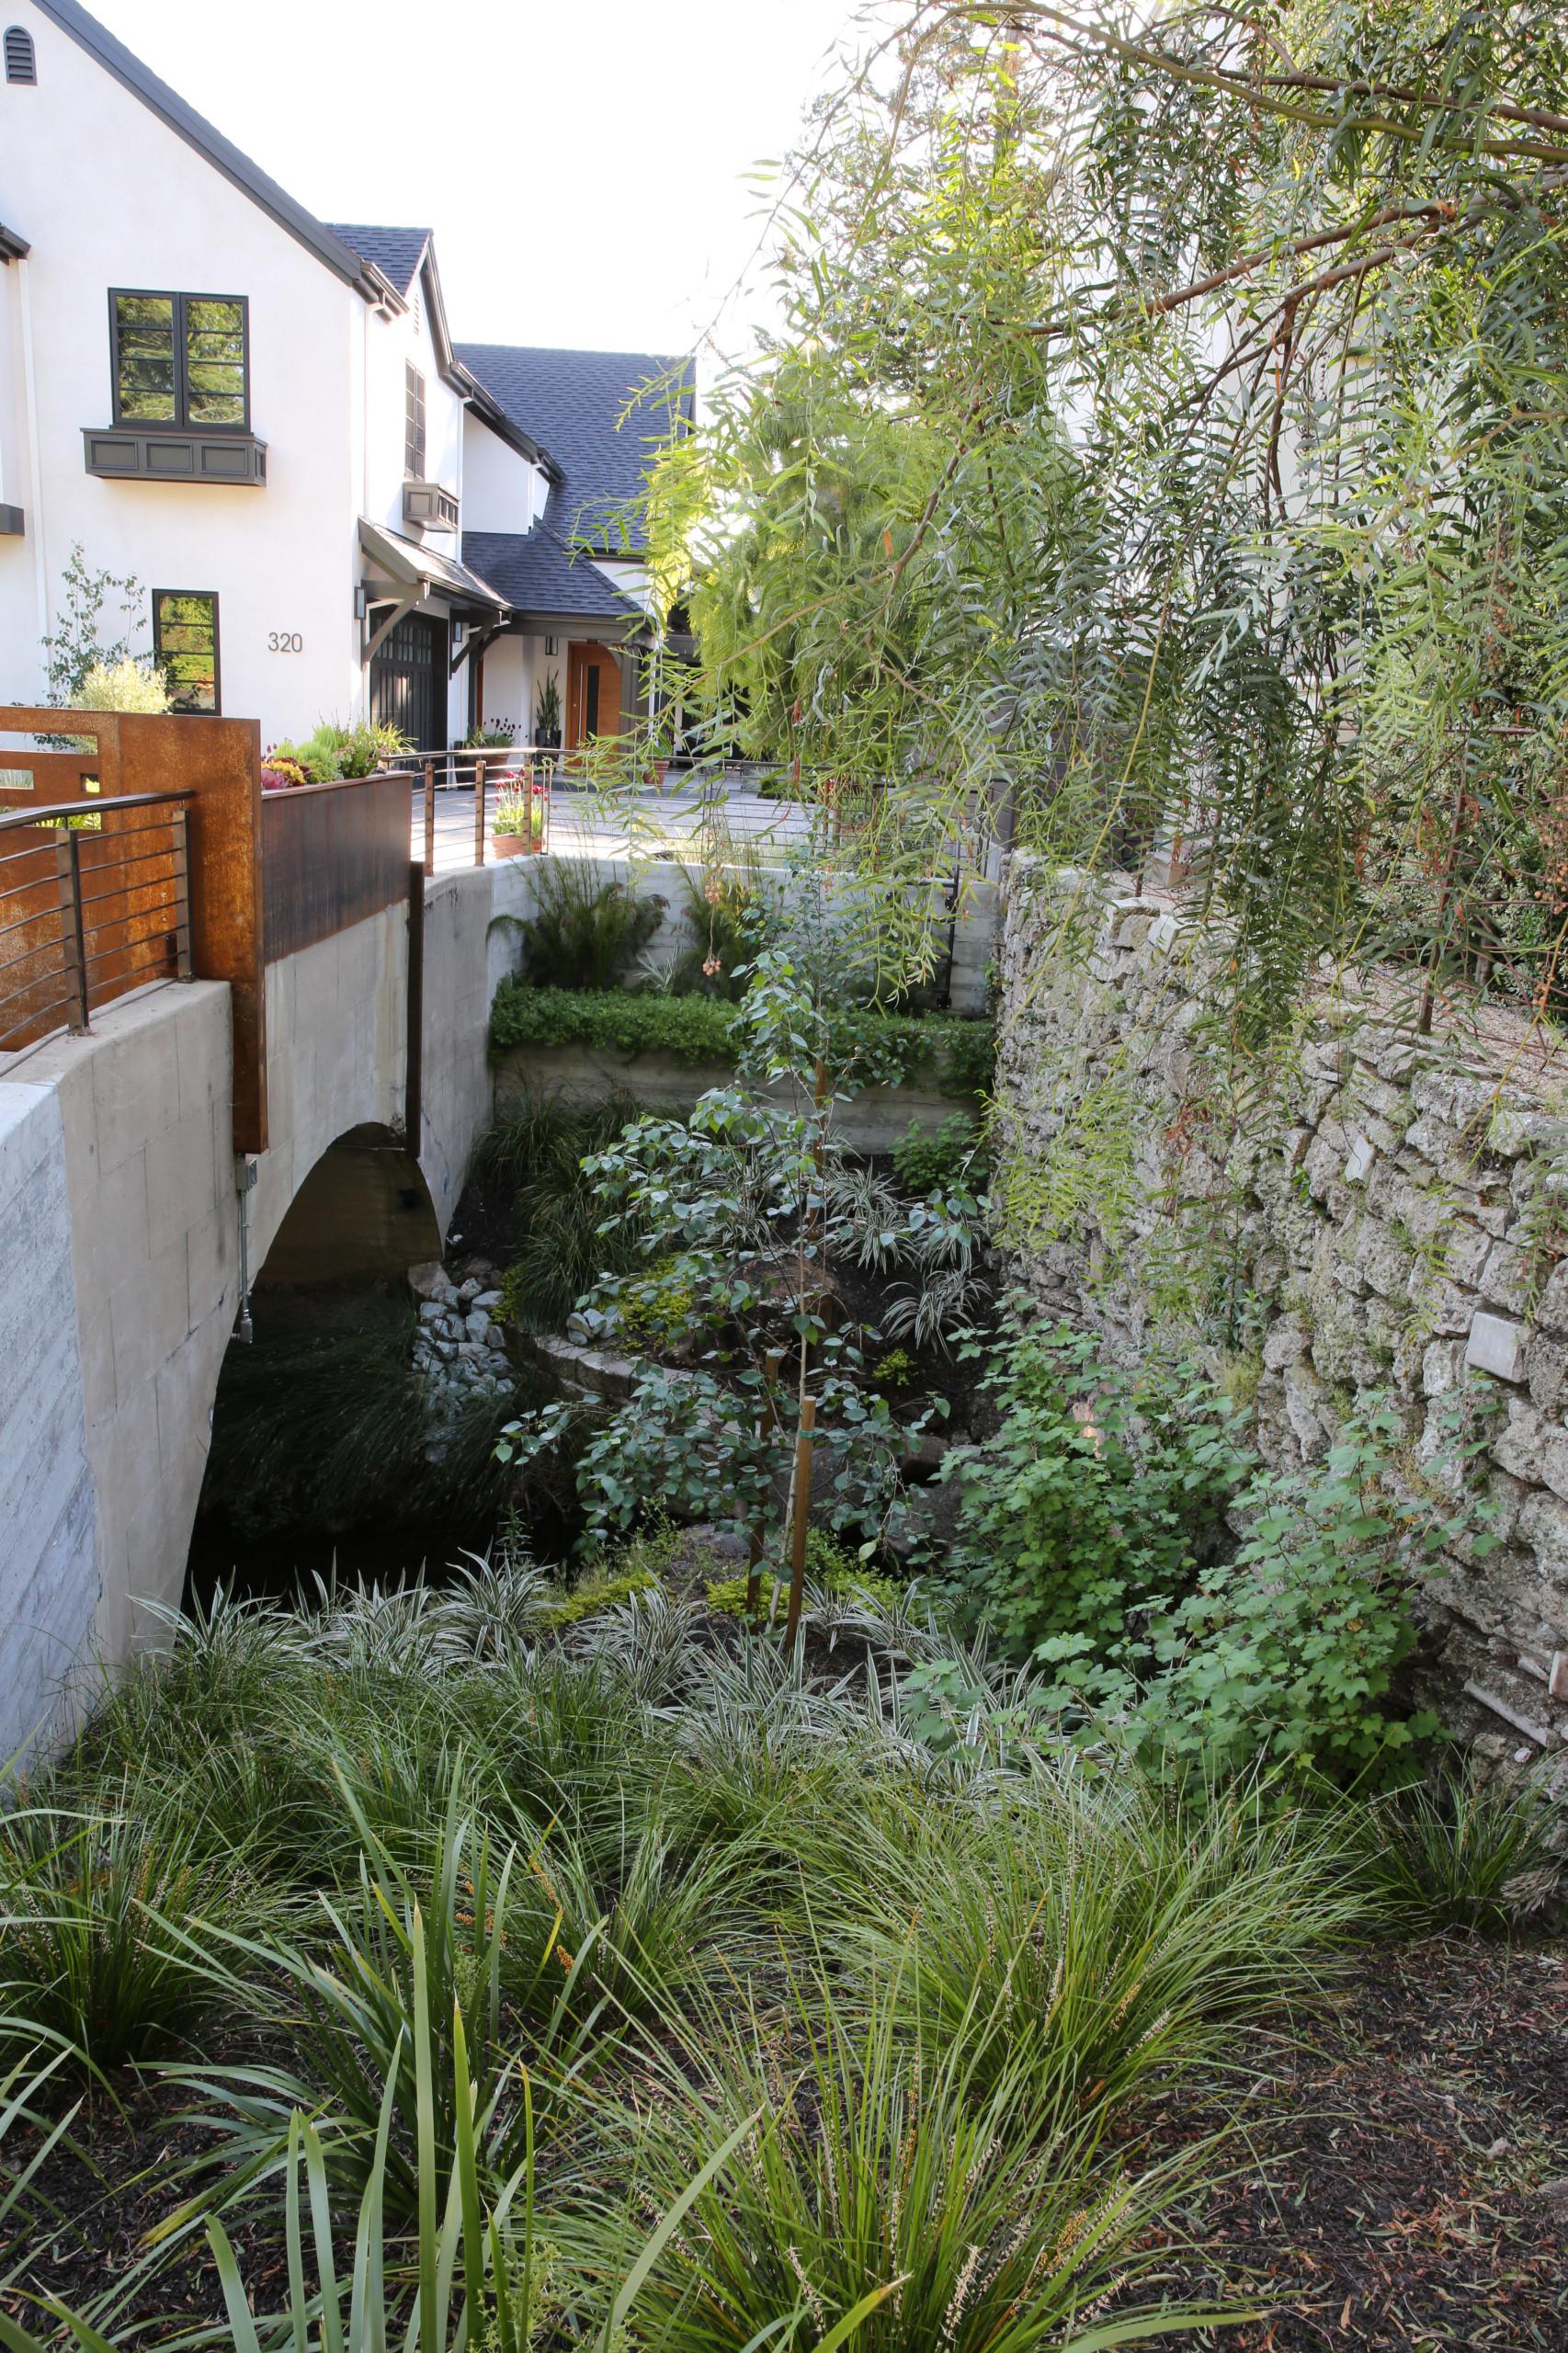 Burlingame Garden Retreat